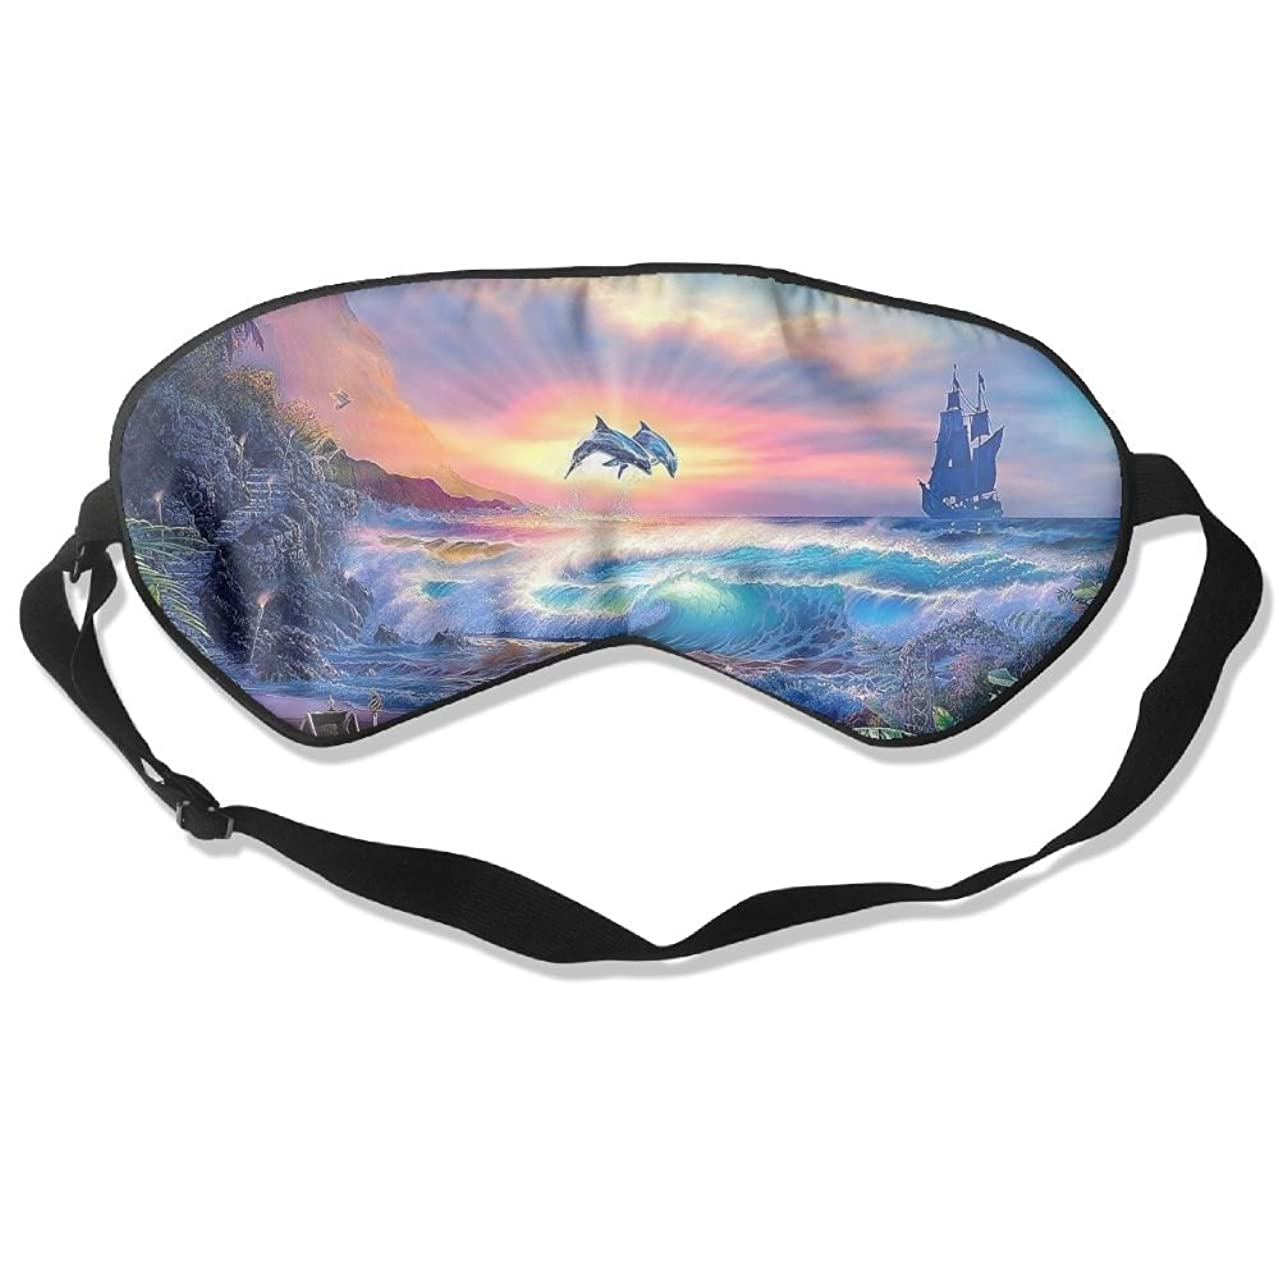 Sleep Mask Dolphin Painting Eye Cover Blackout Eye Masks,Soothing Puffy Eyes,Dark Circles,Stress,Breathable Blindfold for Women Men